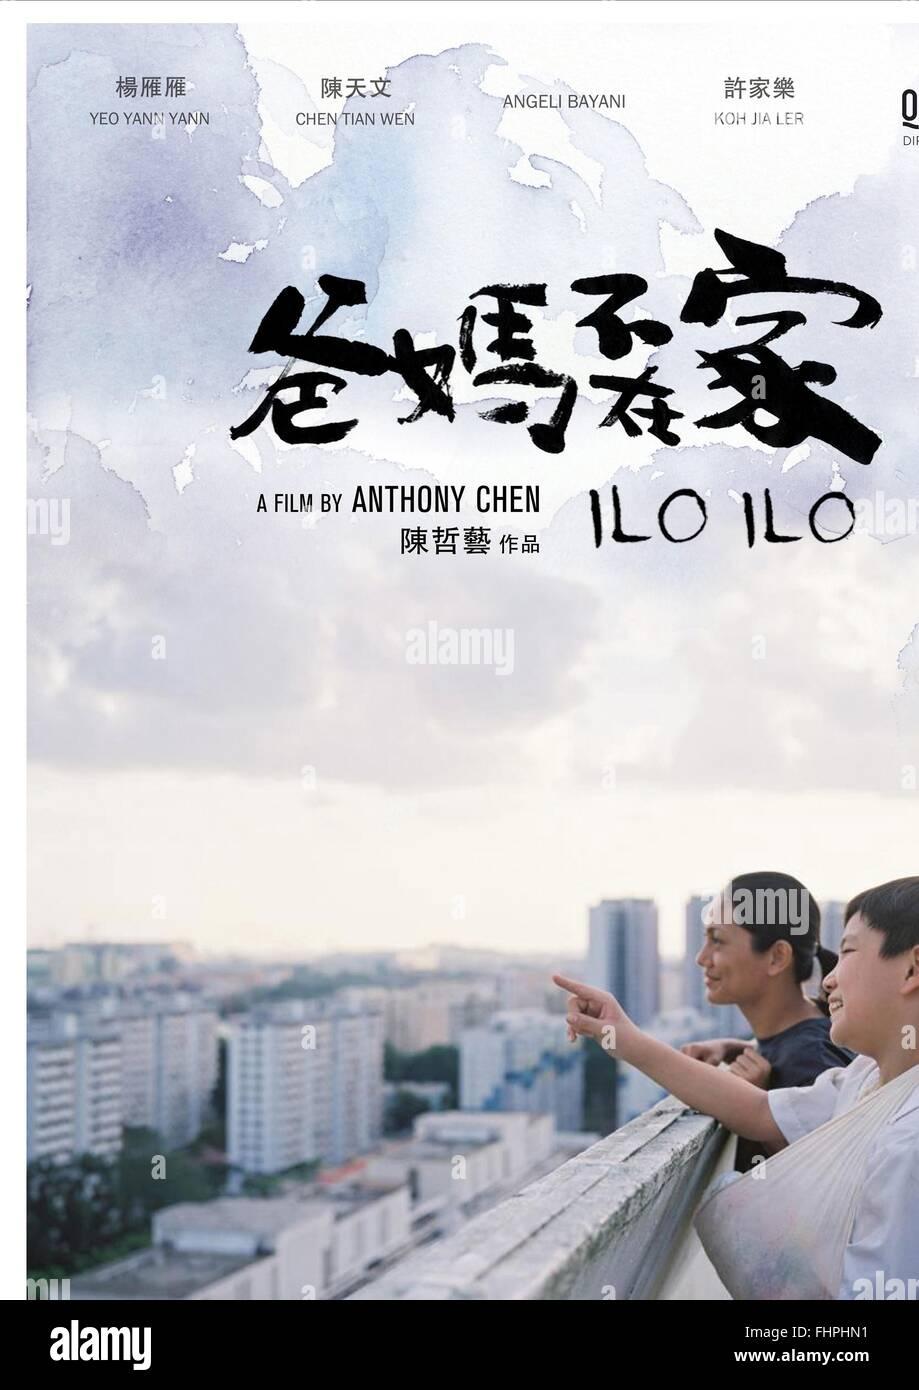 ANGELI BAYANI & JIA LER KOH POSTER ILO ILO (2013) - Stock Image